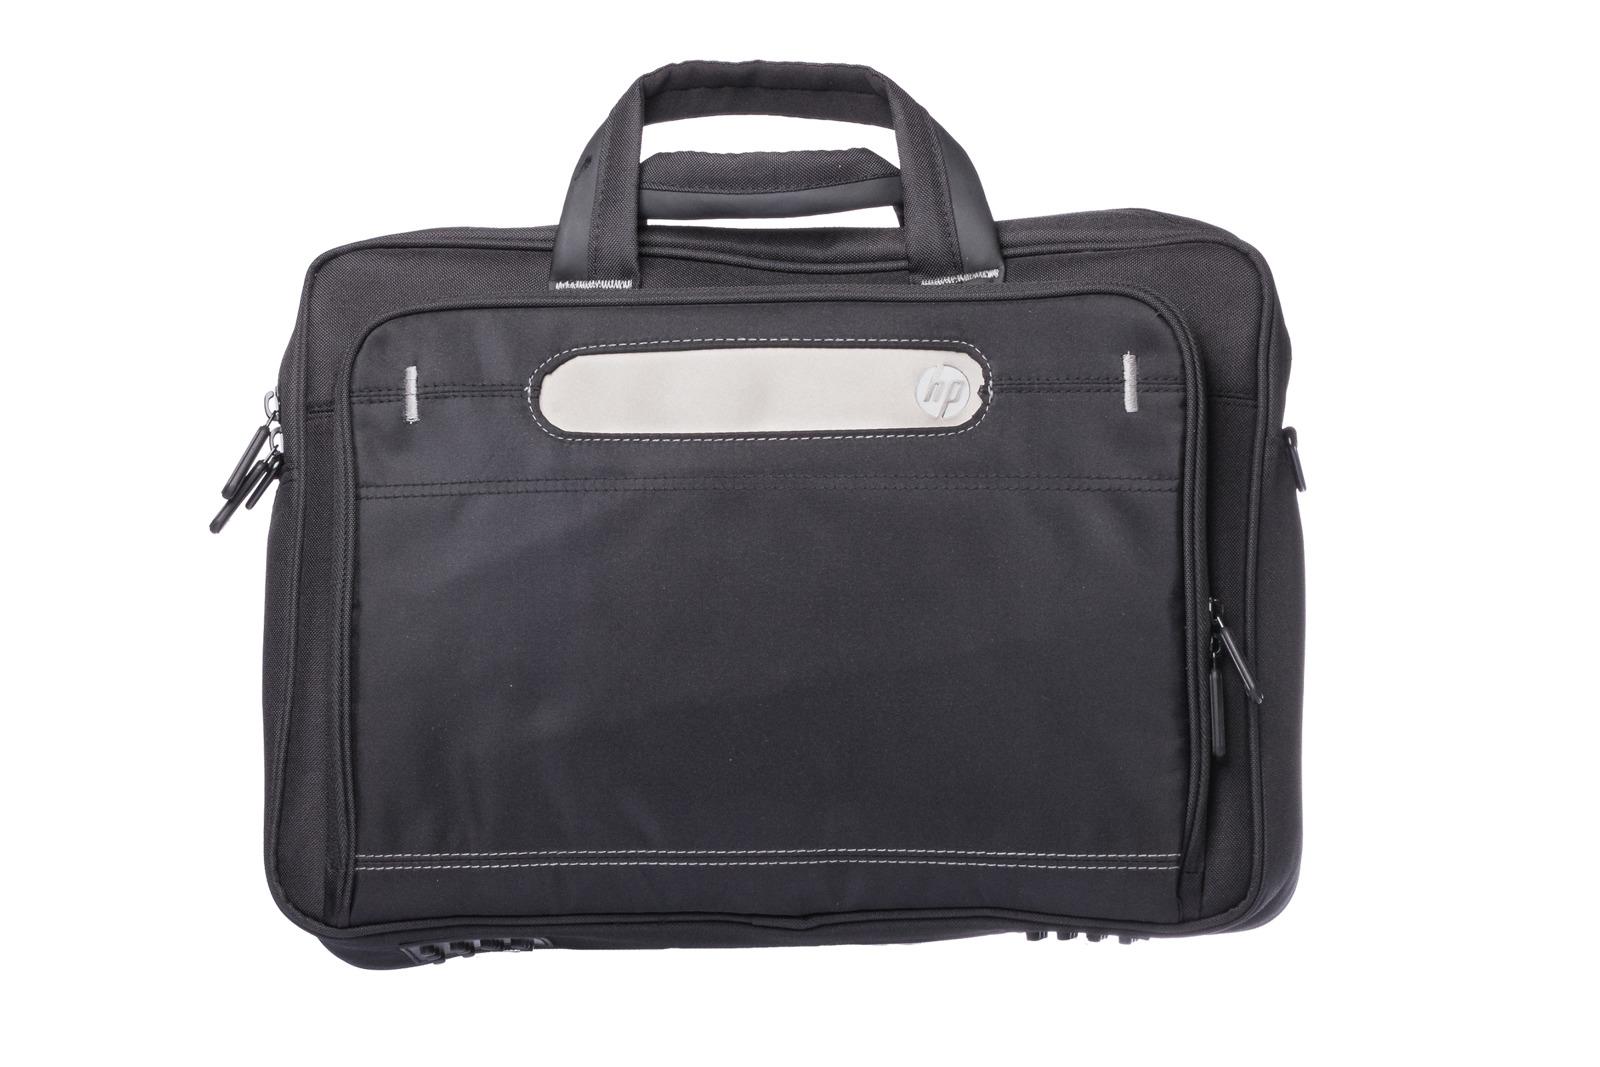 1a440700bb63e Torba na laptopa HP Business Slim Top Load Case 15 | Komputery ...